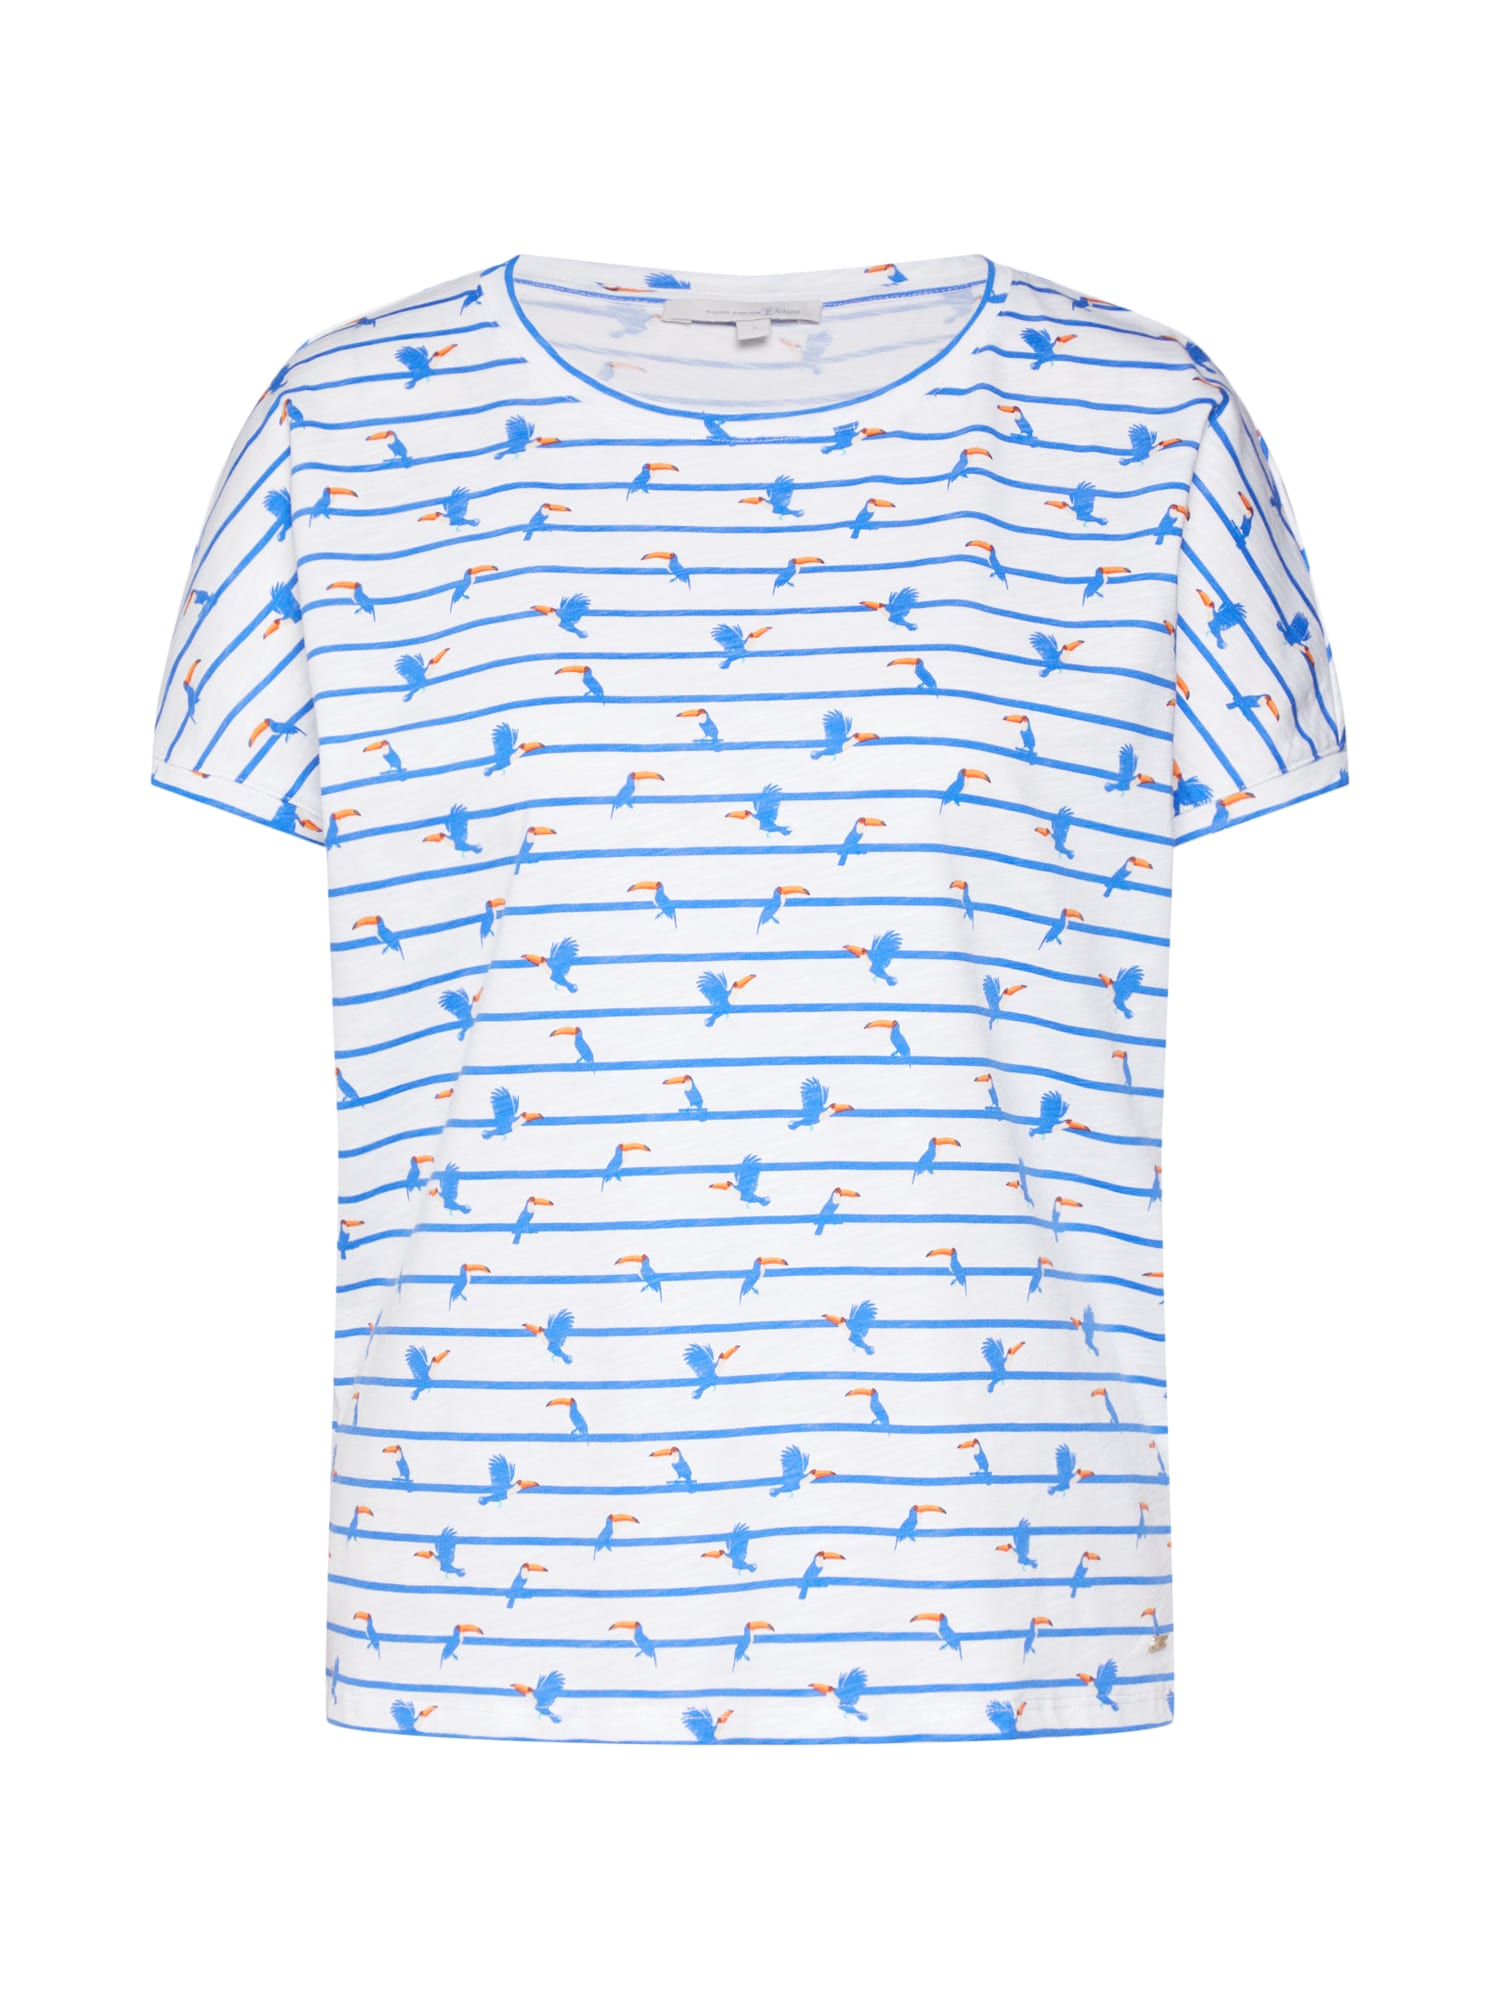 Tričko boxy tee modrá bílá TOM TAILOR DENIM